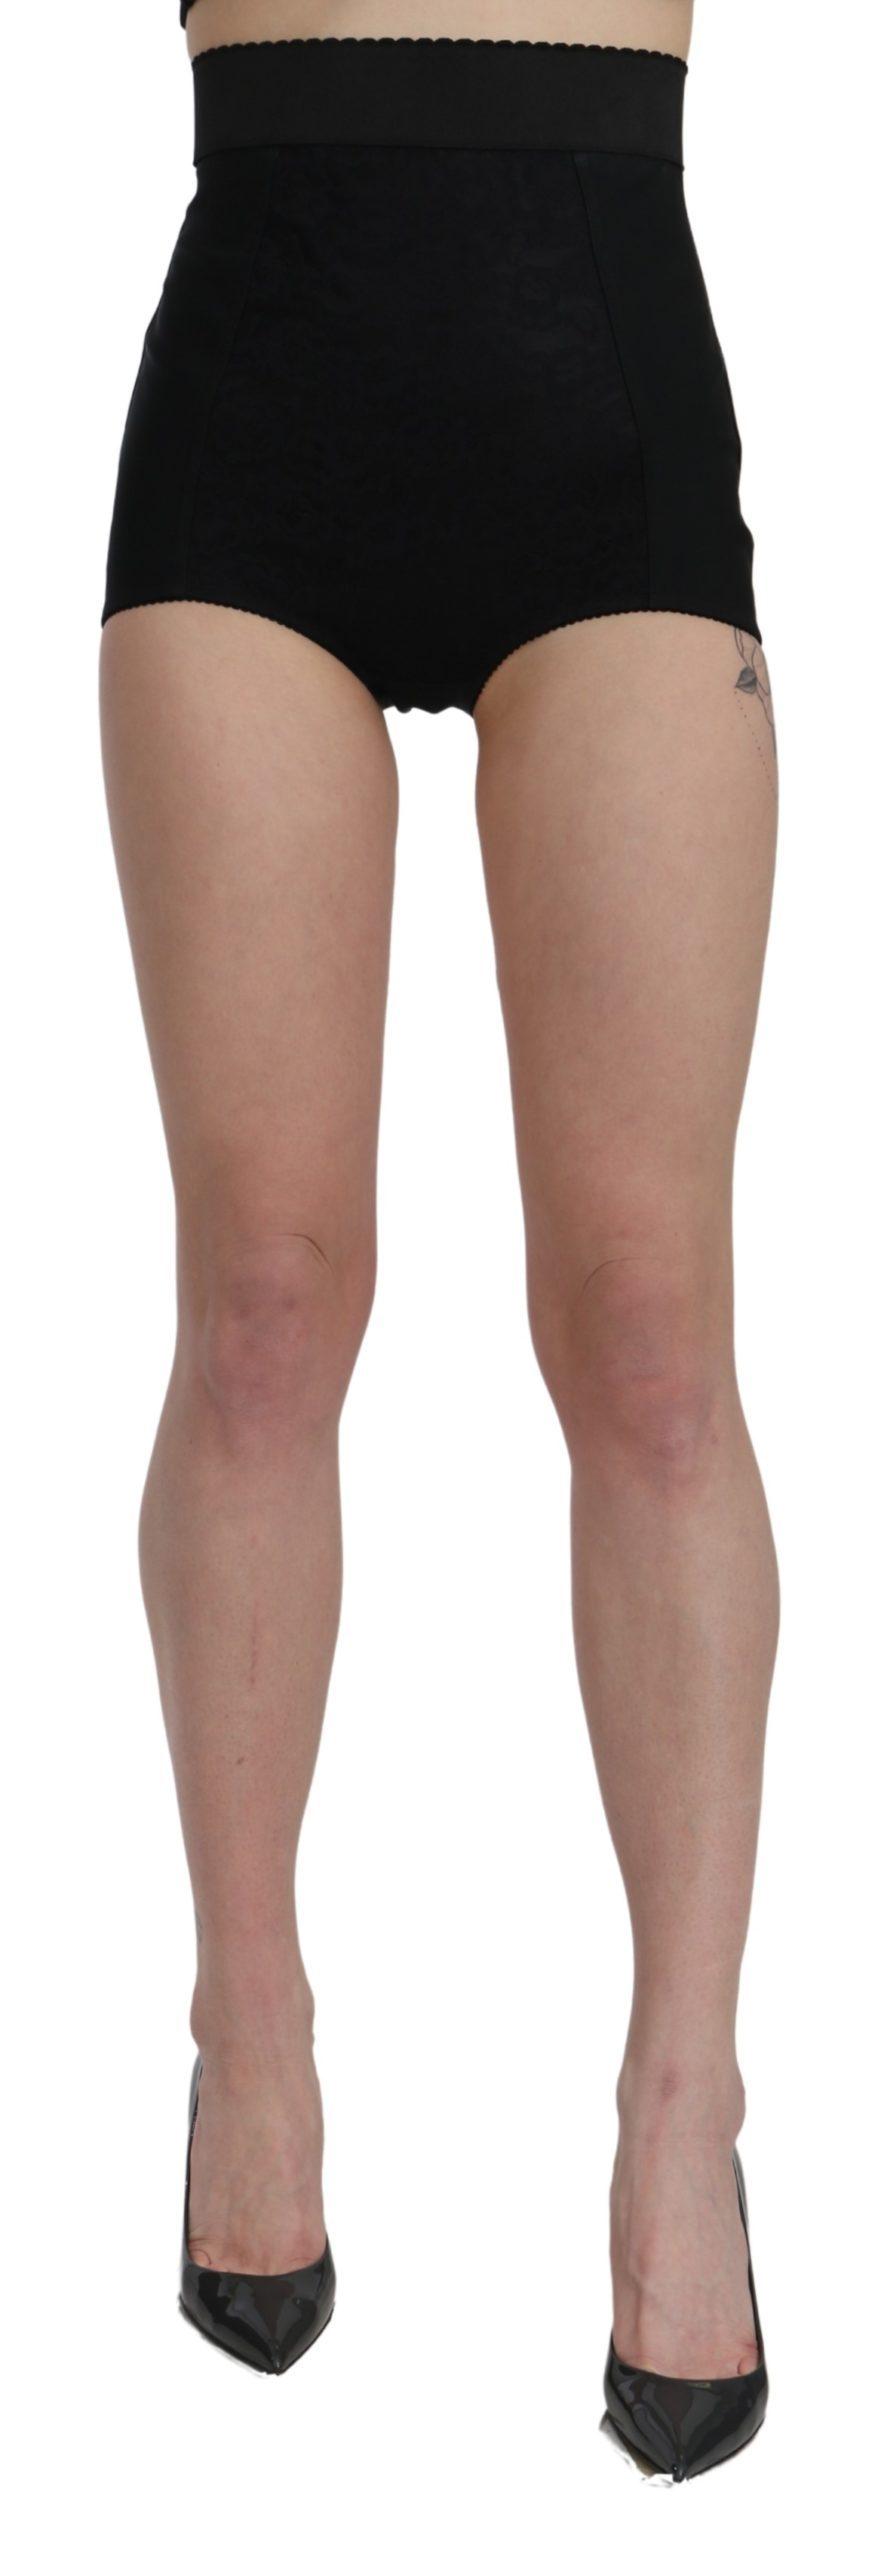 Dolce & Gabbana Women's High Waist Mini Hot Pants Nylon Shorts Black SKI1452 - IT40 S